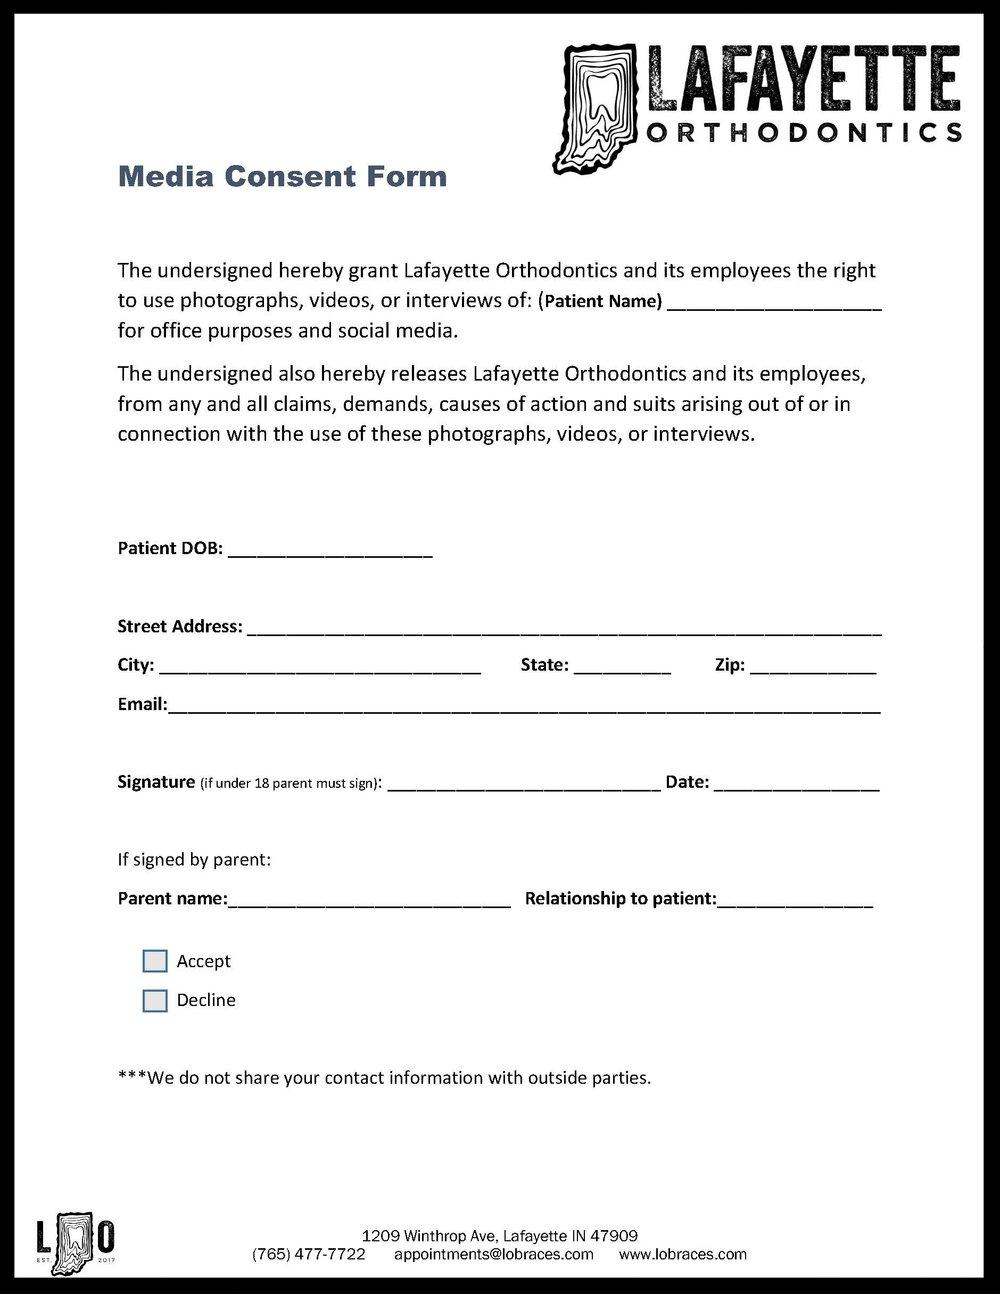 Media Consent Form